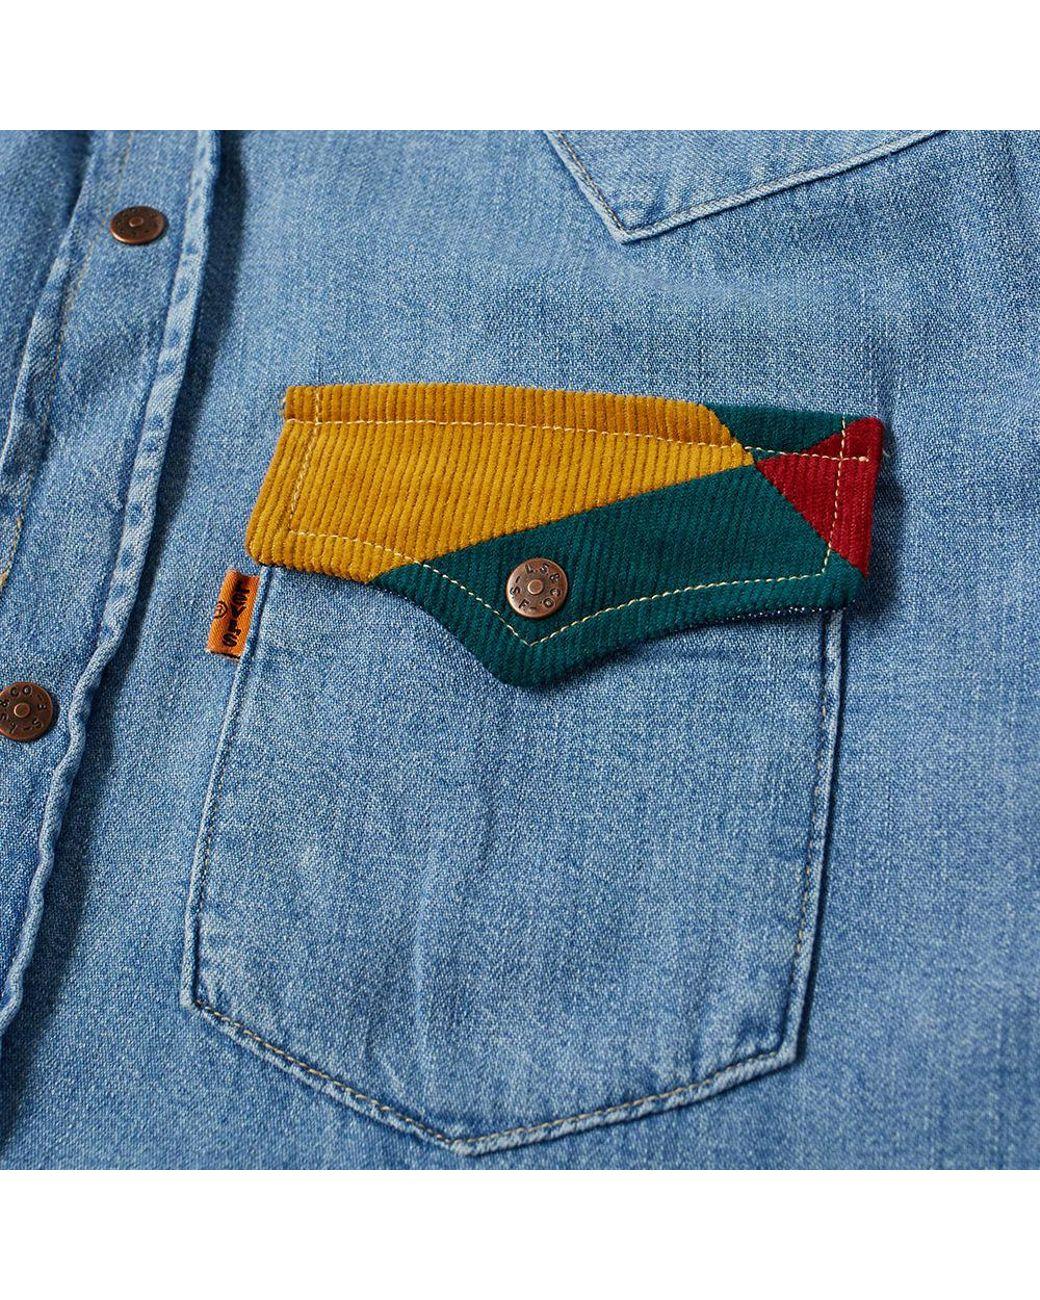 0703f40d76 Lyst - Levi s Levi s Vintage Clothing 70 s Denim Shirt in Blue for Men -  Save 5%